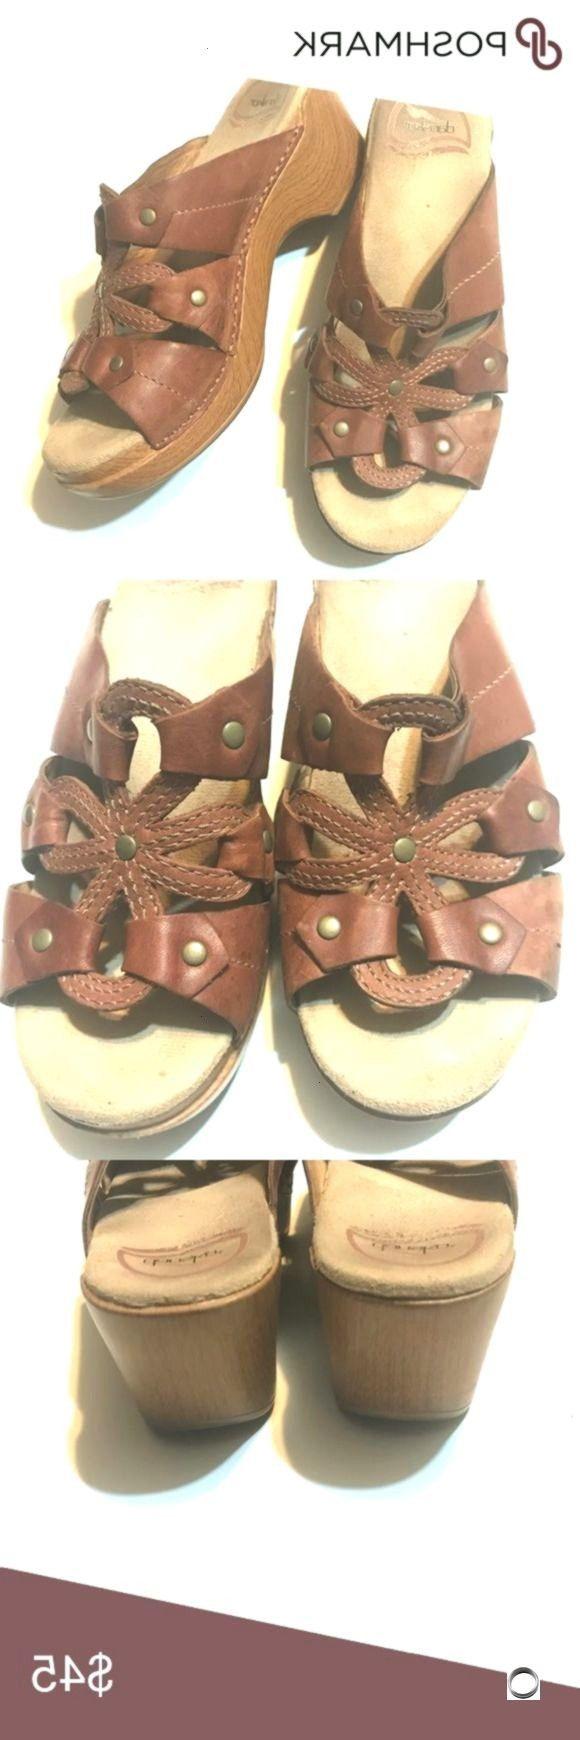 Brown Premium Leather Open Toe Clog Sandals Dansko Serena slip on cDANSKO Brown Premium Leather Open Toe Clog Sandals Dansko Serena slip on c Victoria secret Pink dog plu...